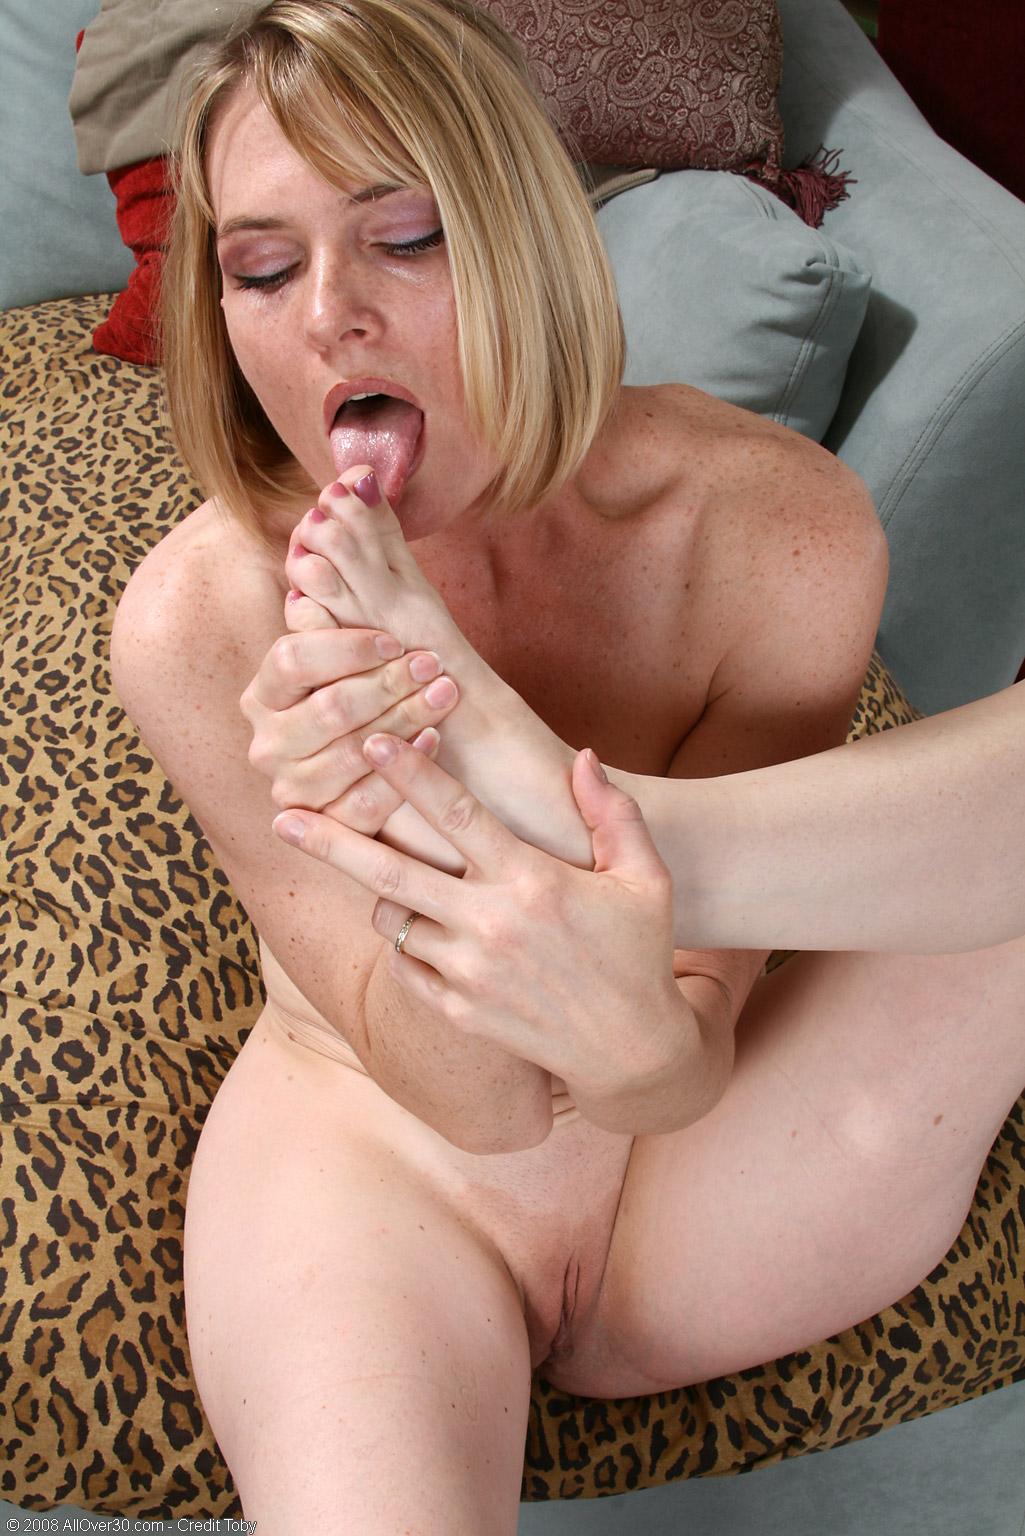 Milf lesbian lick pussy and bondage